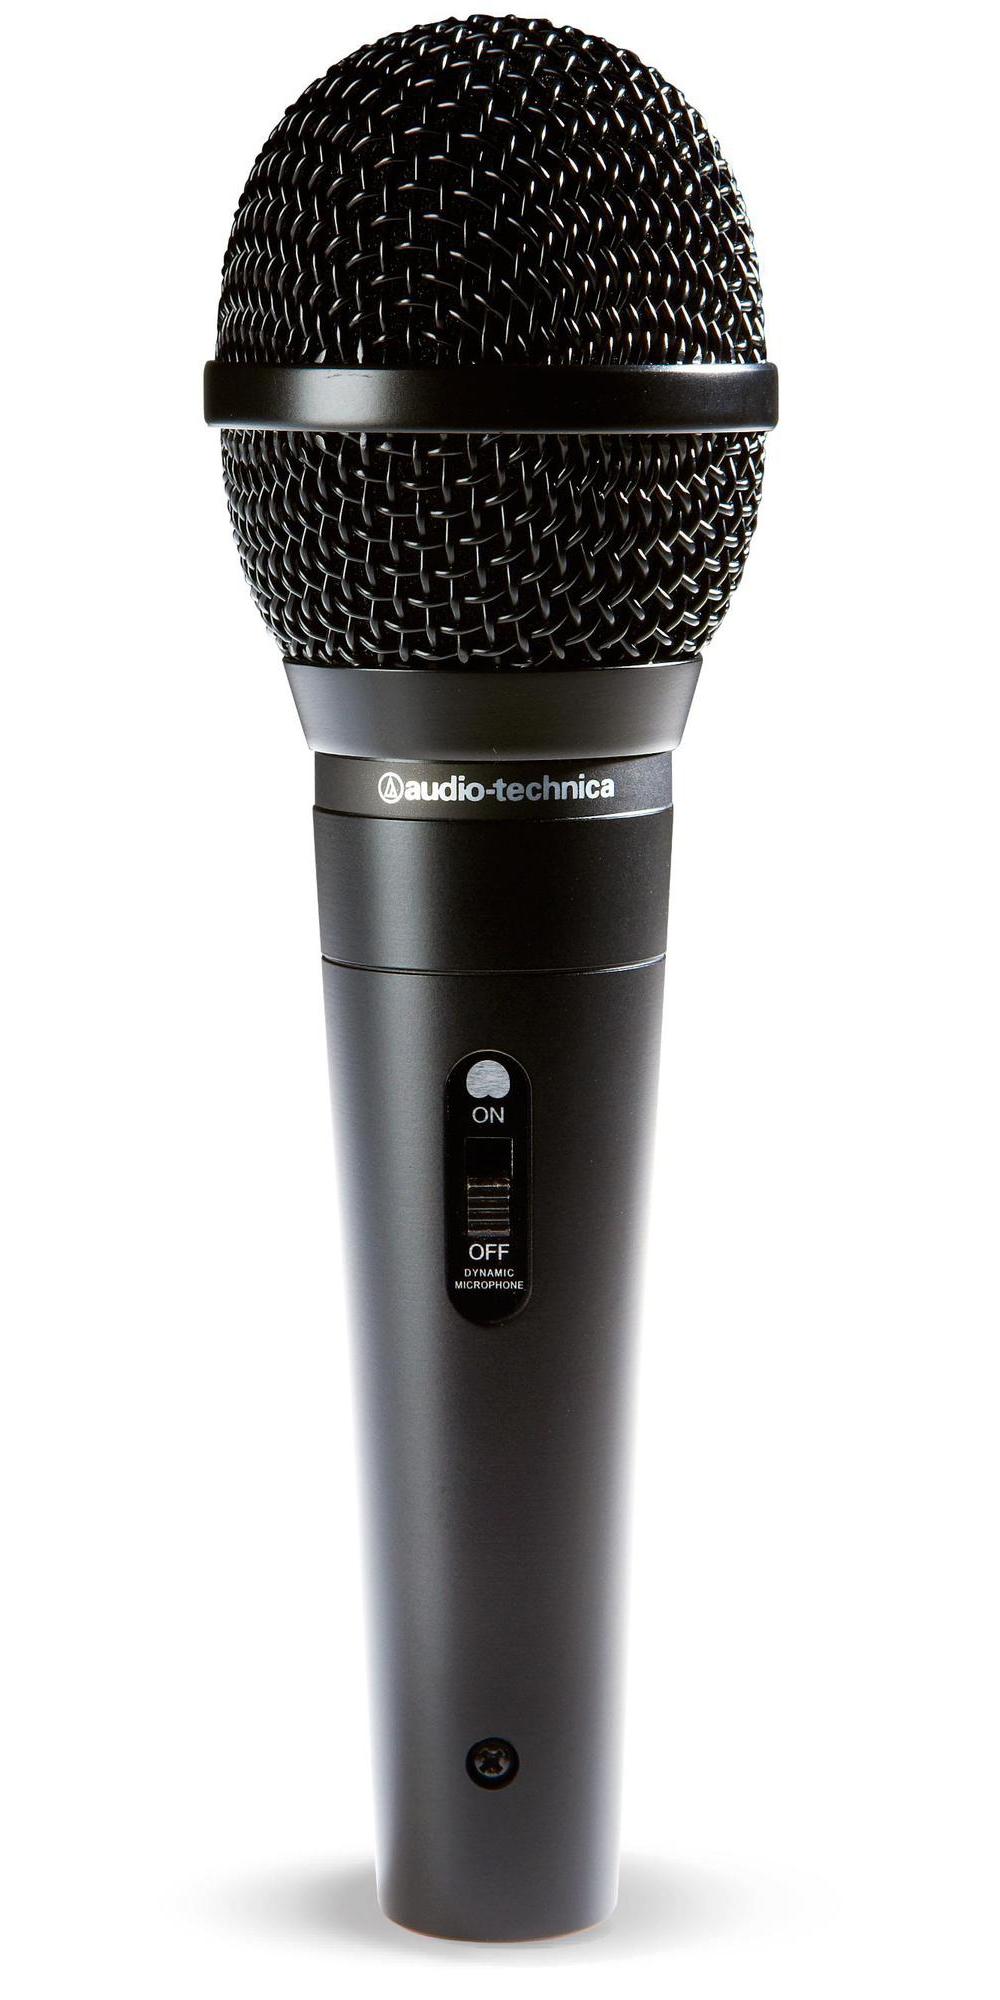 audio technica m4000s handheld dynamic microphone 42005154890 ebay. Black Bedroom Furniture Sets. Home Design Ideas